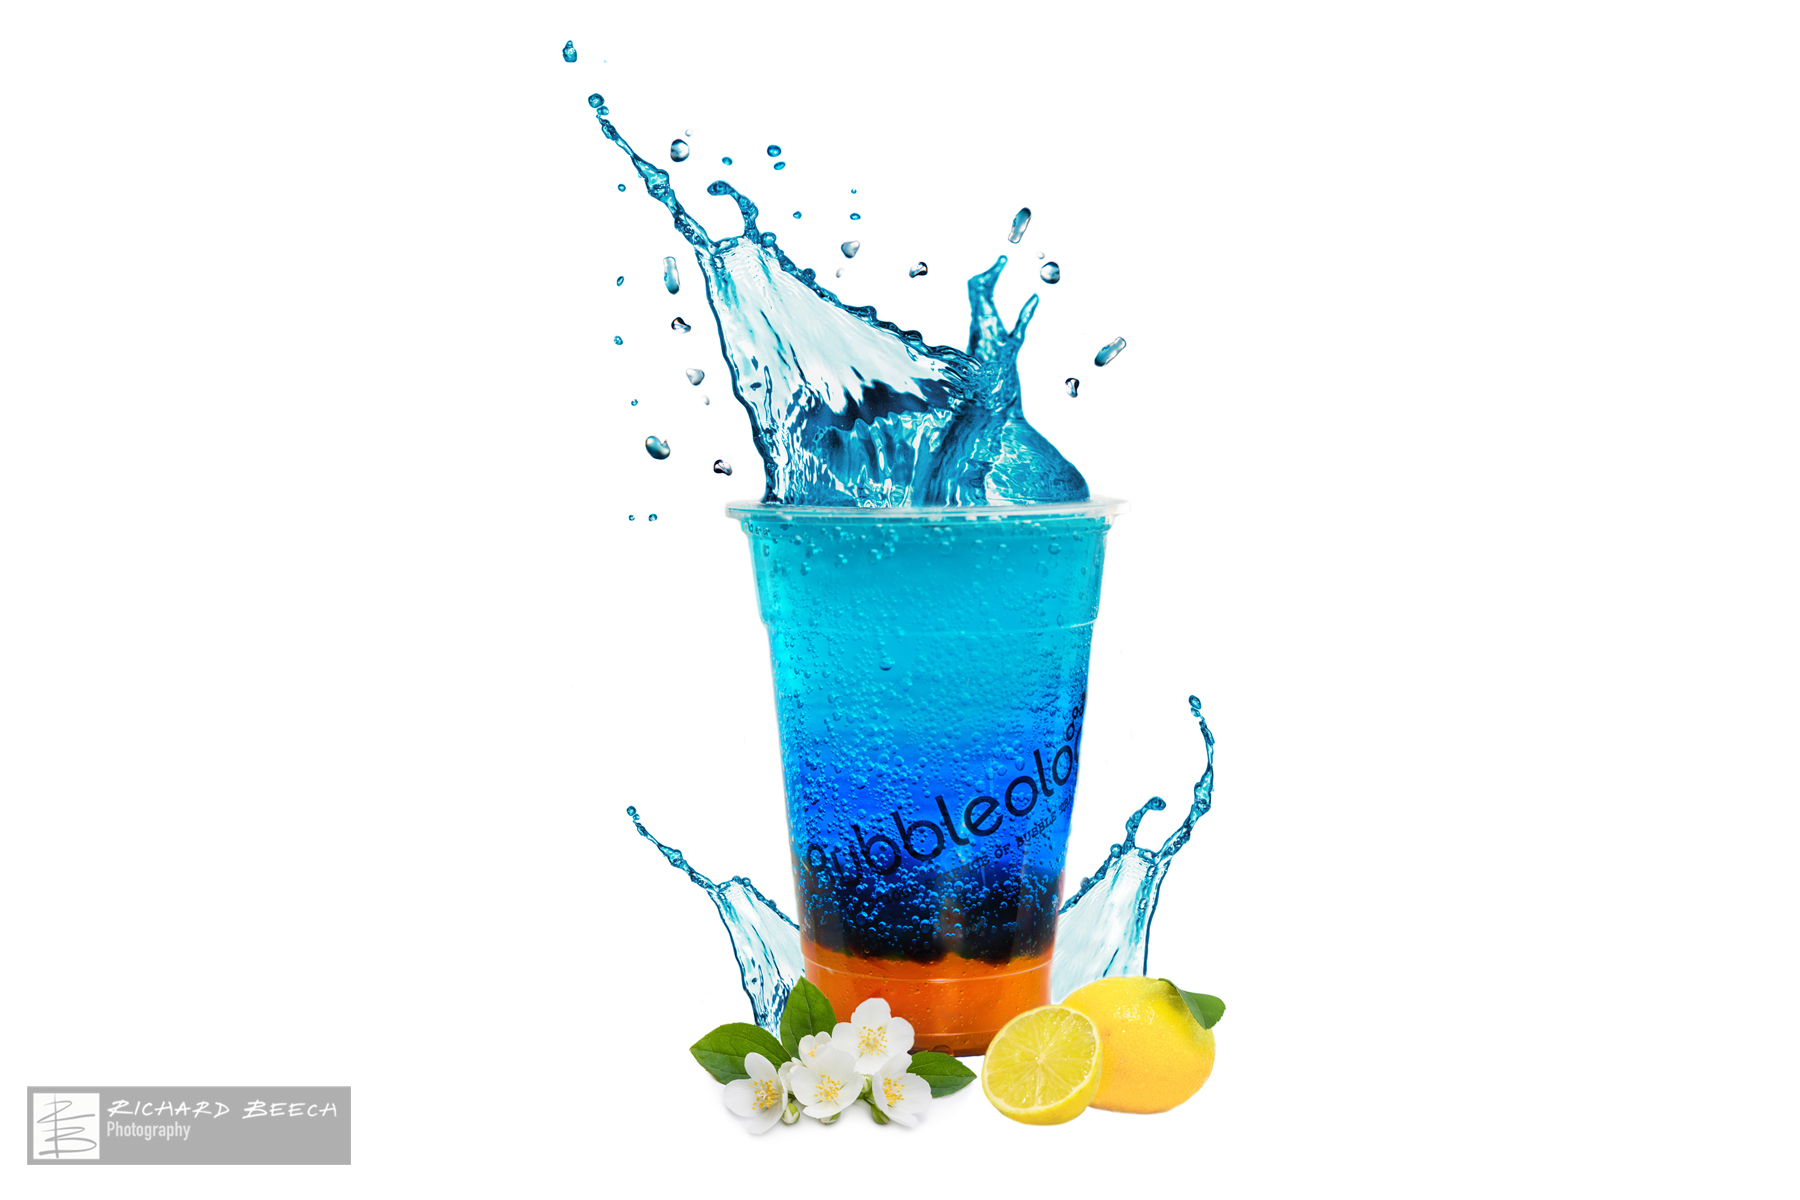 Electric Yuzu Splash Advert